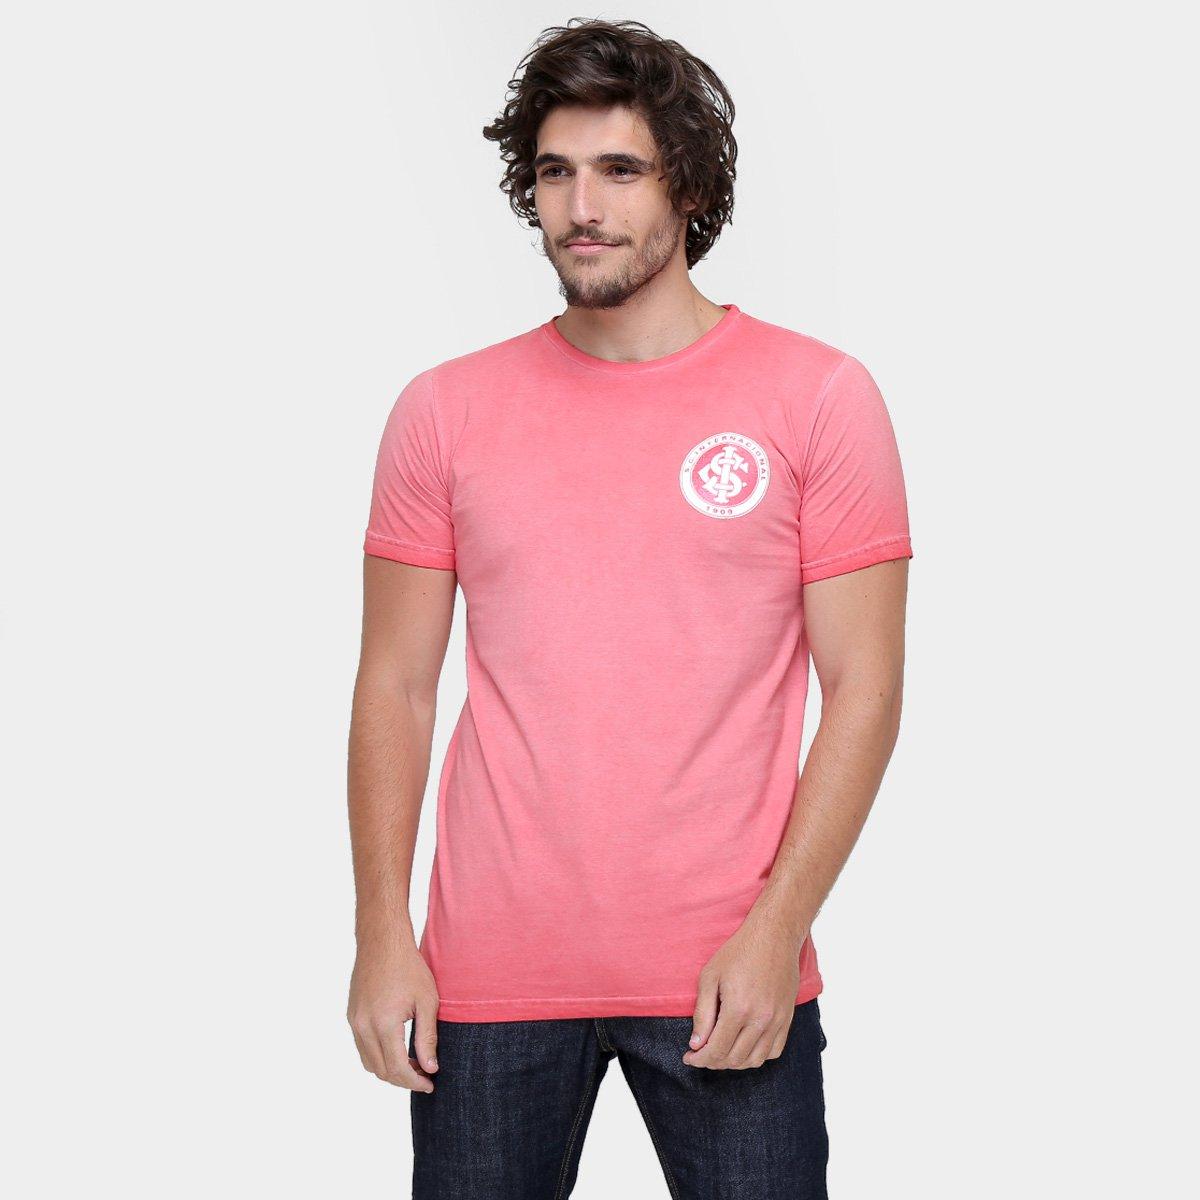 990838837e8 Camiseta Internacional Colorado Stone Masculina - Compre Agora ...